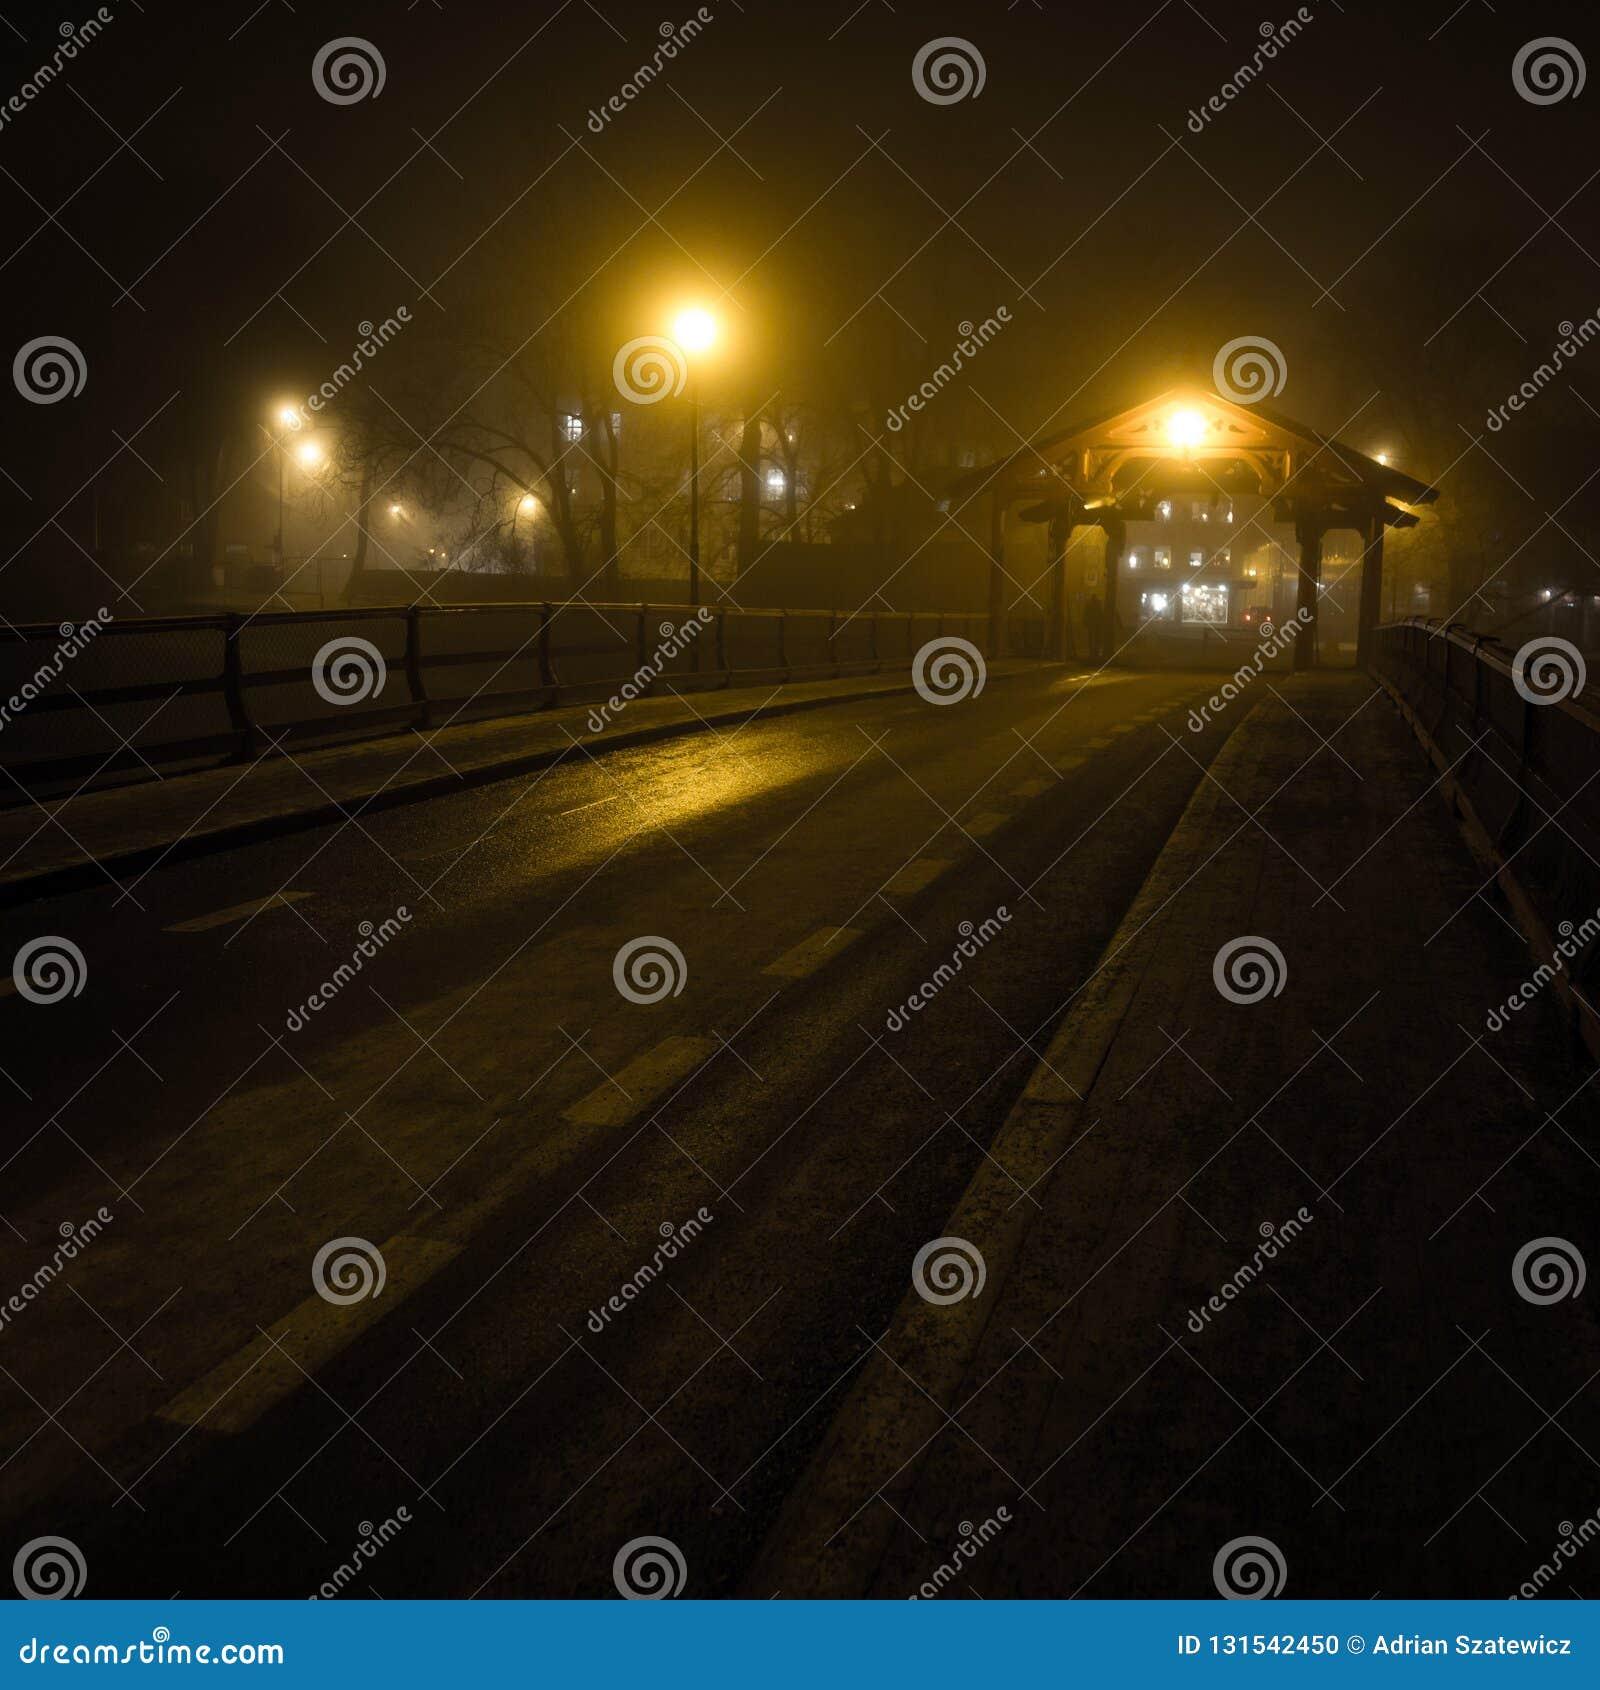 Old bridge near Bakklandet area called Gamle By Bru. Trondheim in Norway